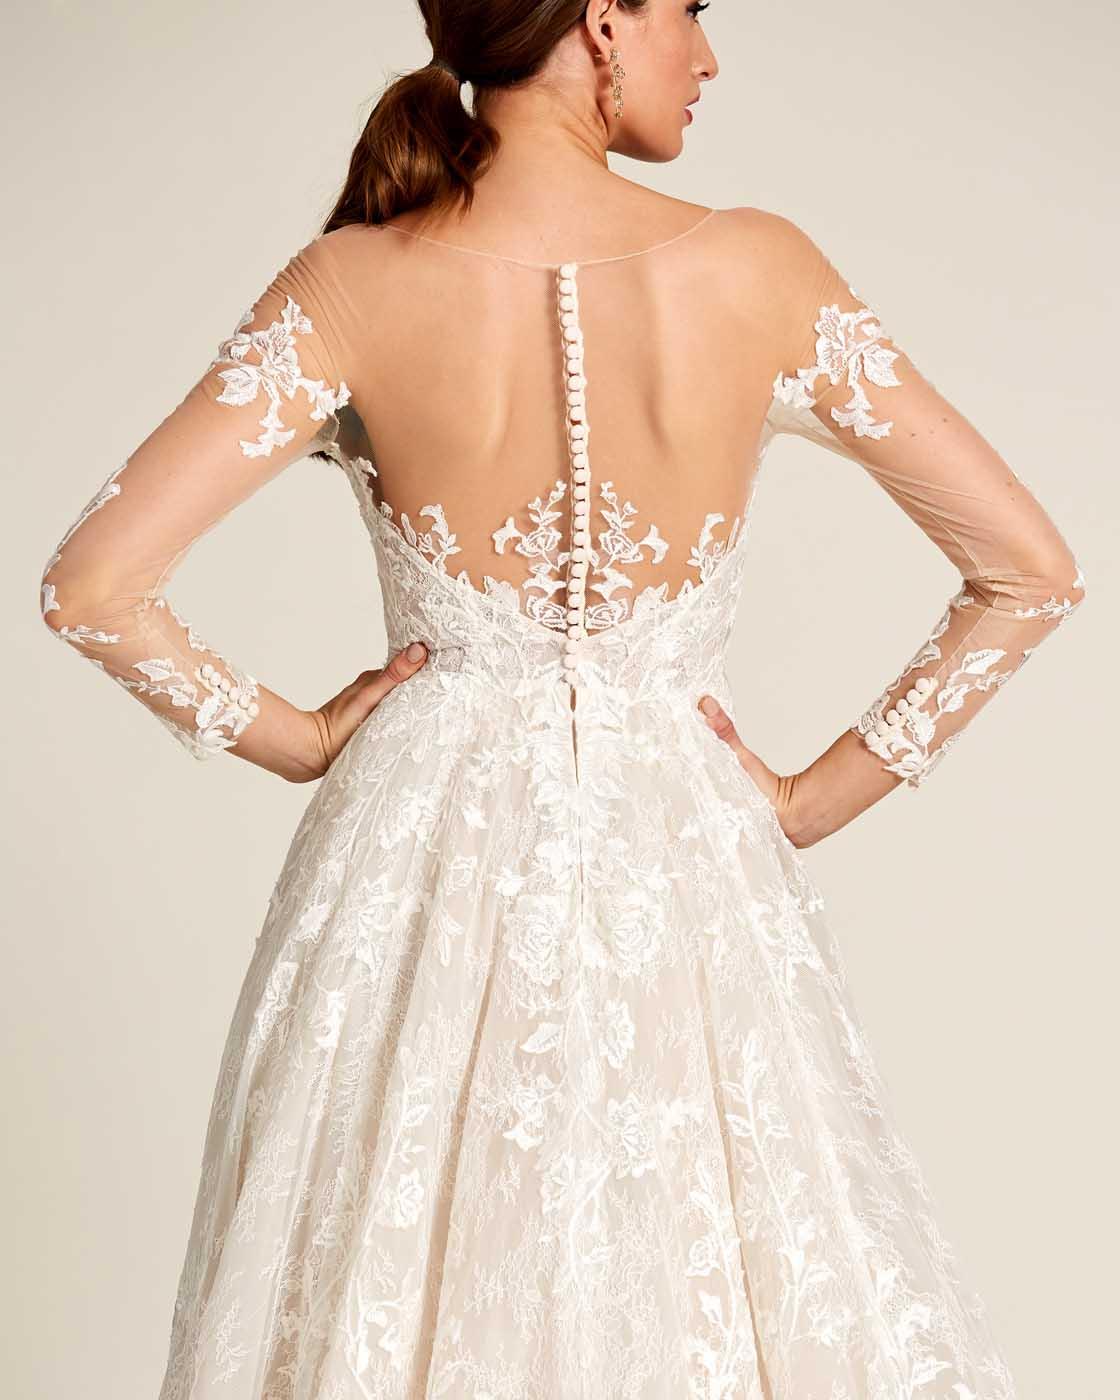 White Illusion Neckline Embroidered Sleeves Wedding Dress - Detail Back